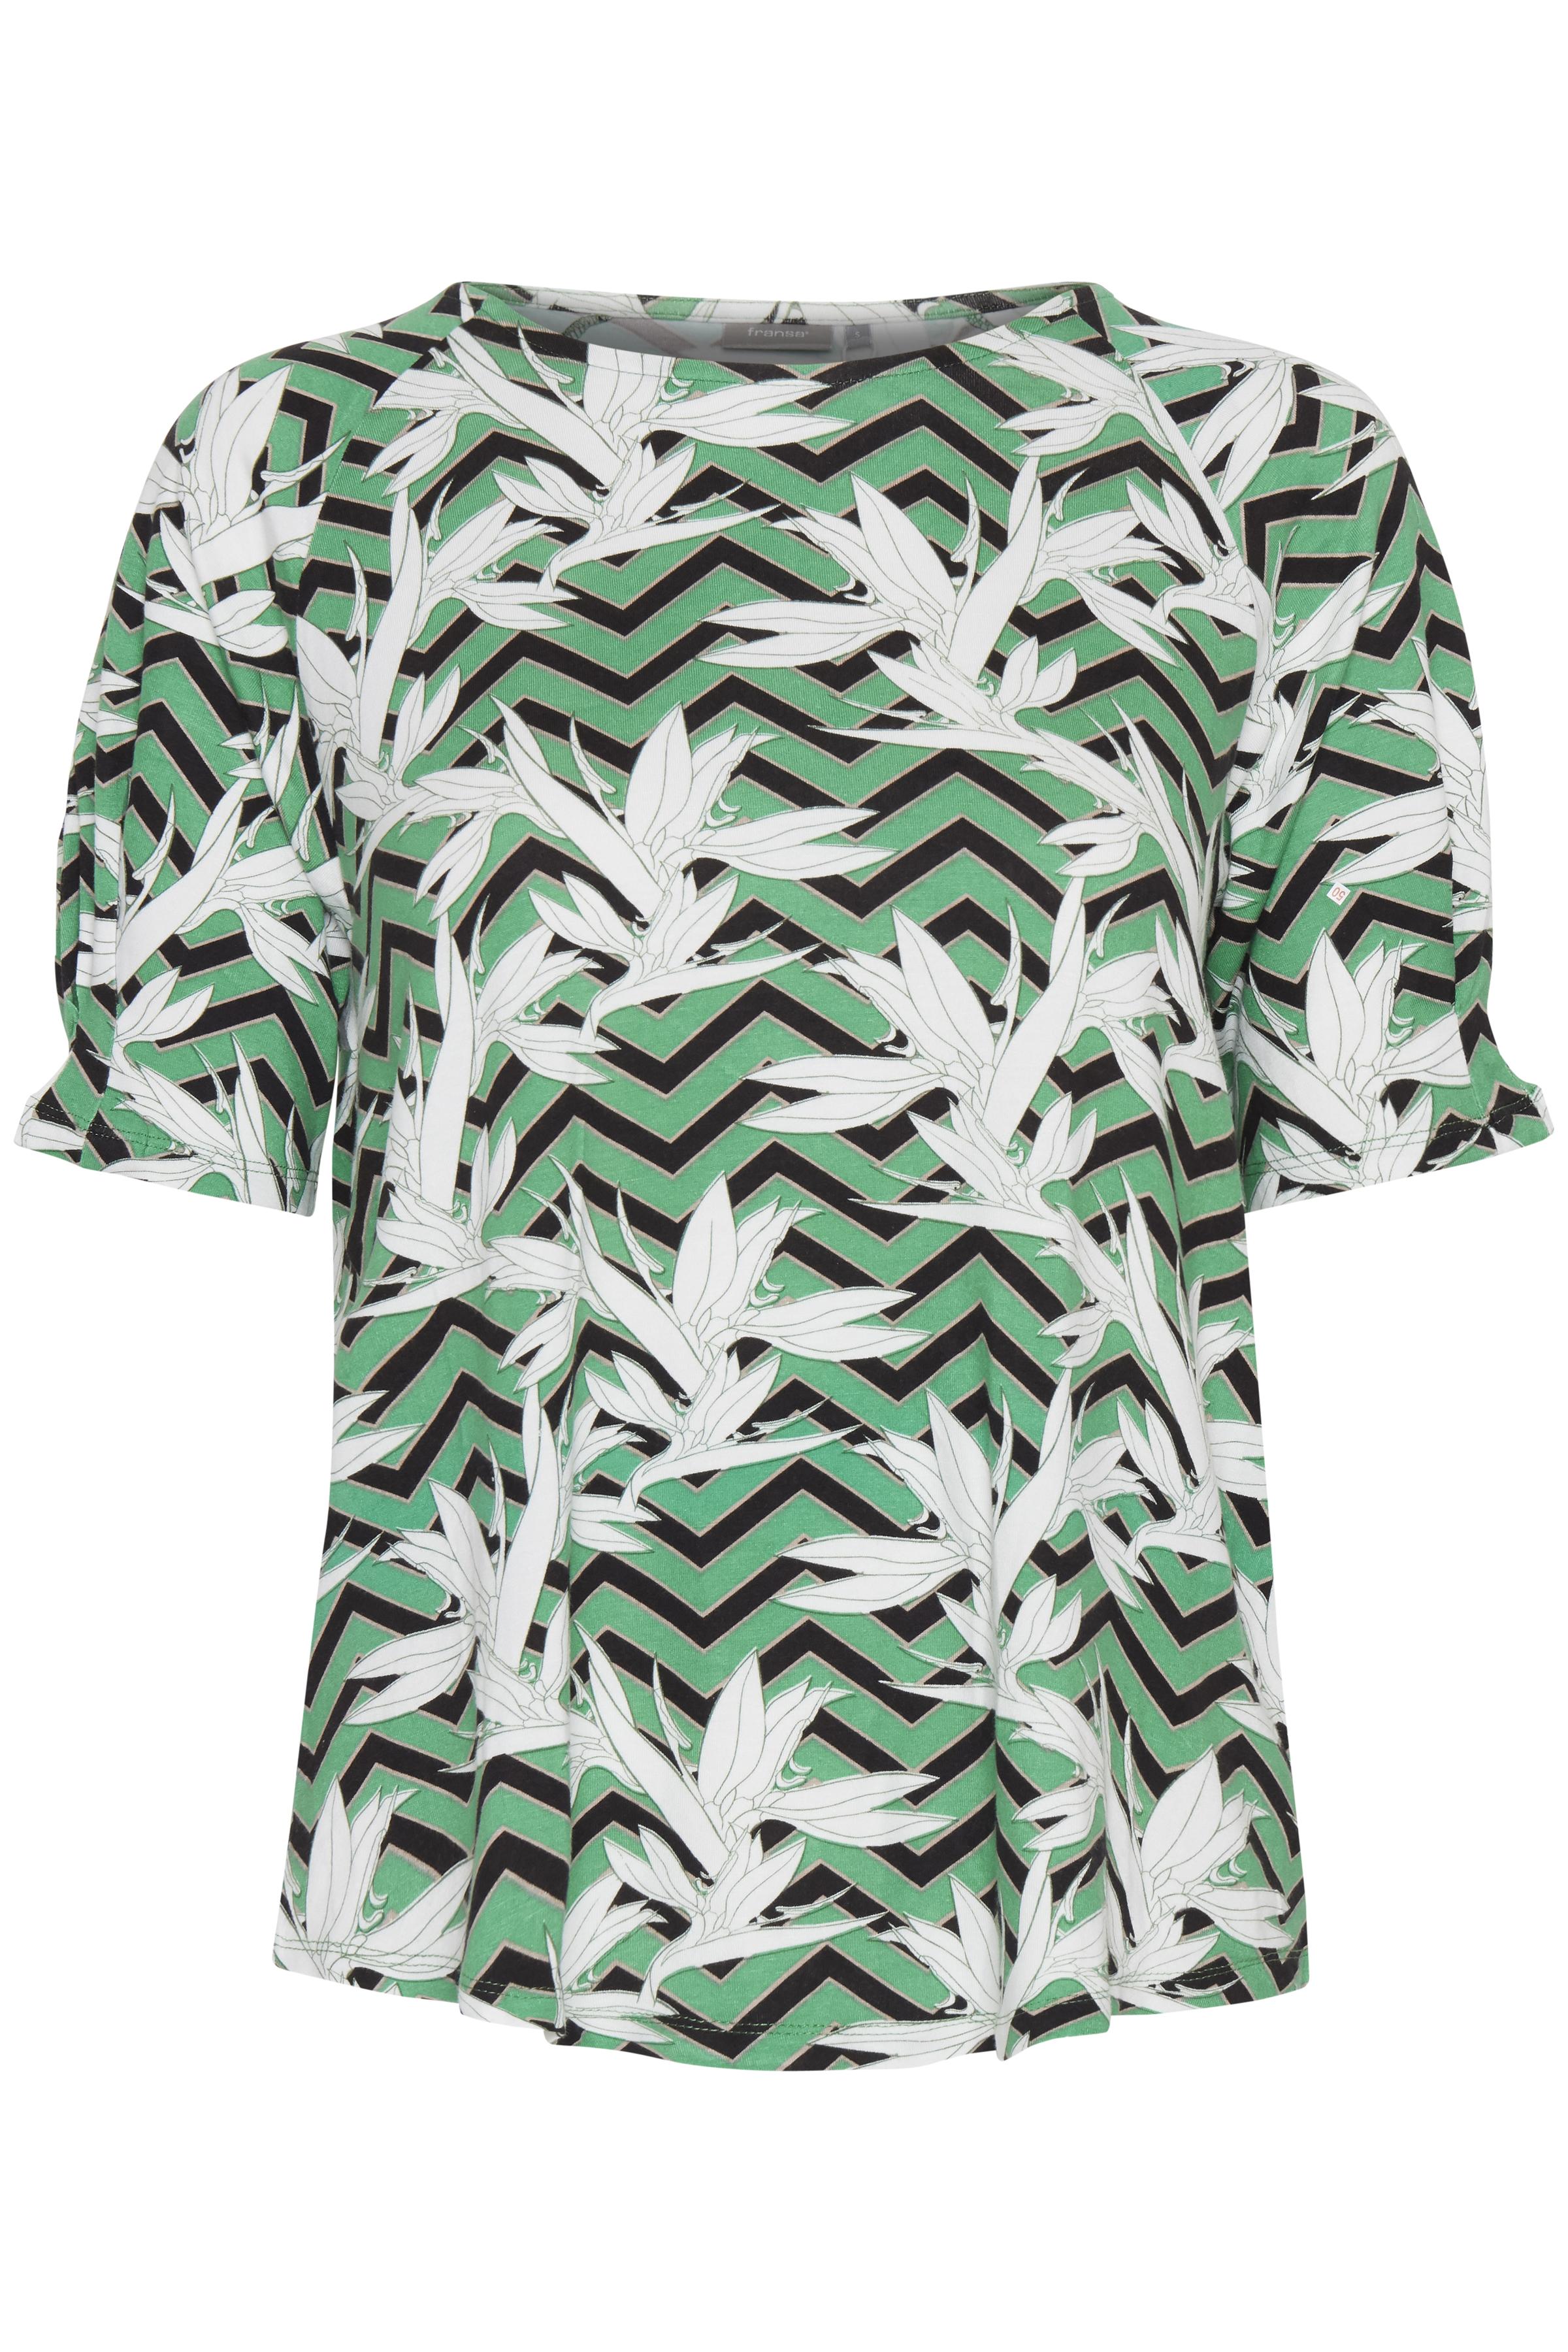 Grün/weiß Kurzarm T-Shirt von Fransa – Shoppen Sie Grün/weiß Kurzarm T-Shirt ab Gr. XS-XXL hier